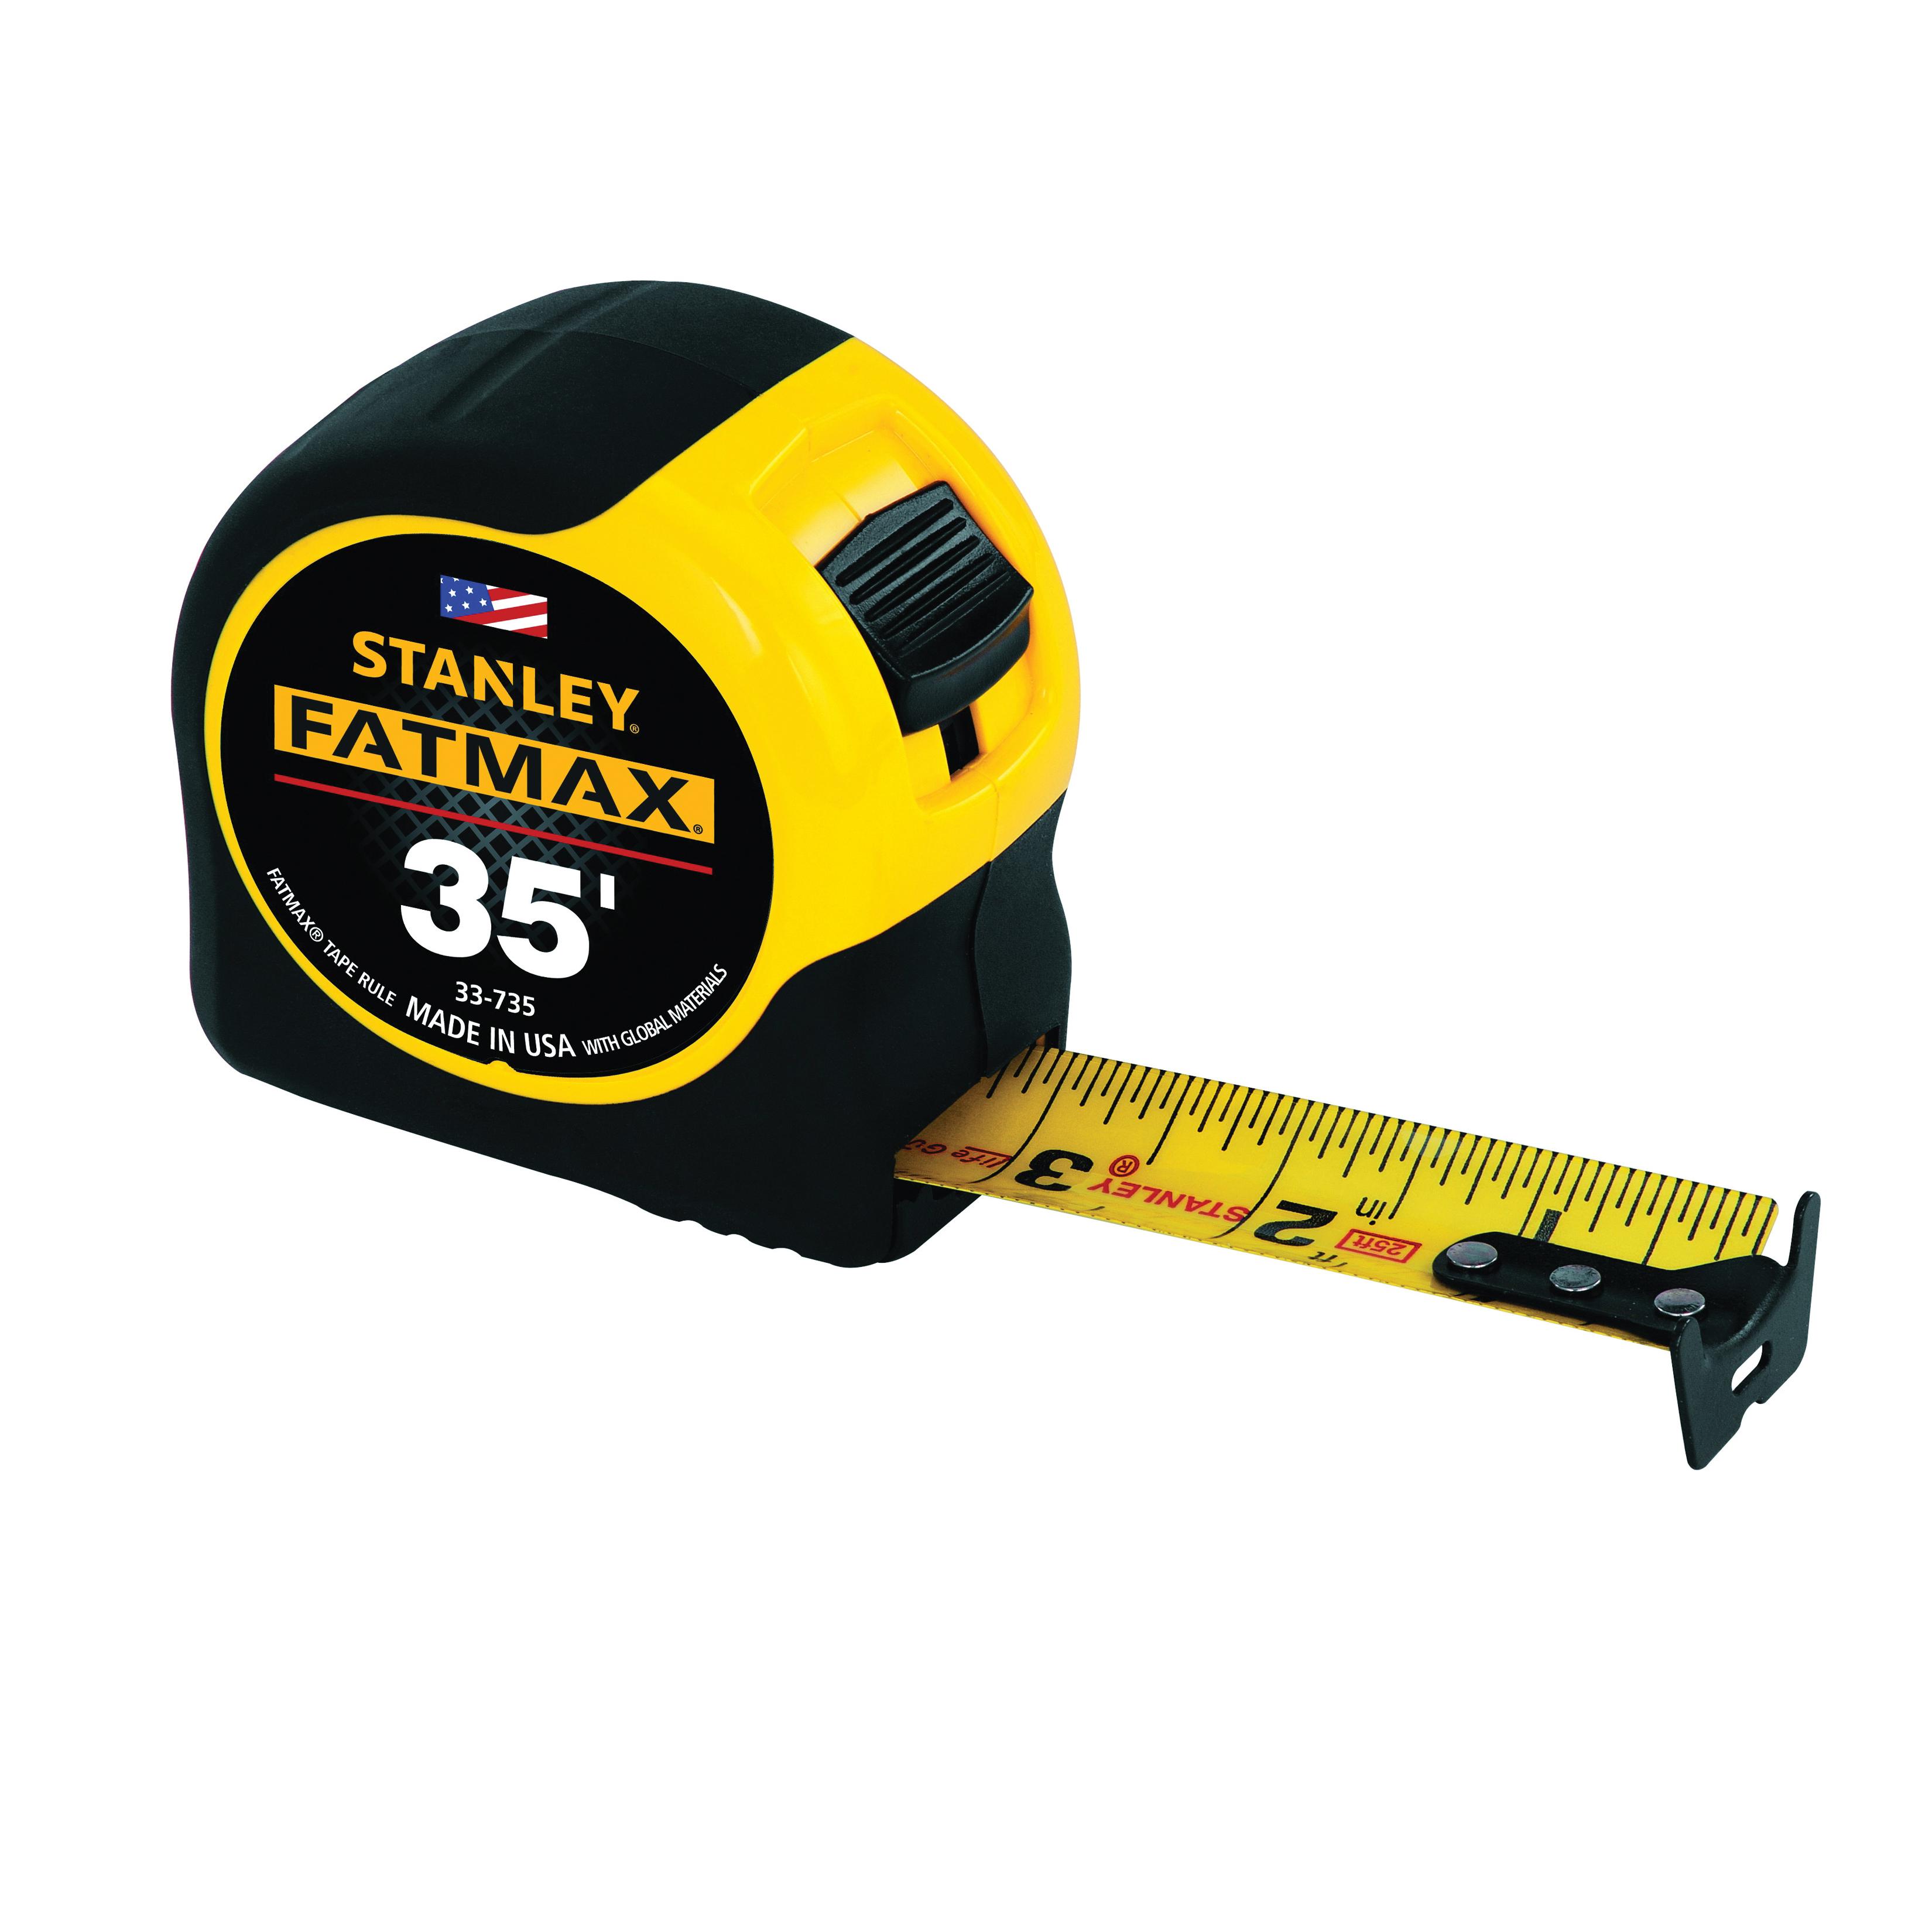 Stanley® FatMax® 33-735 Reinforced Tape Rule With BladeArmor®, 35 ft L x 1-1/4 in W Blade, Mylar® Polyester Film, Imperial